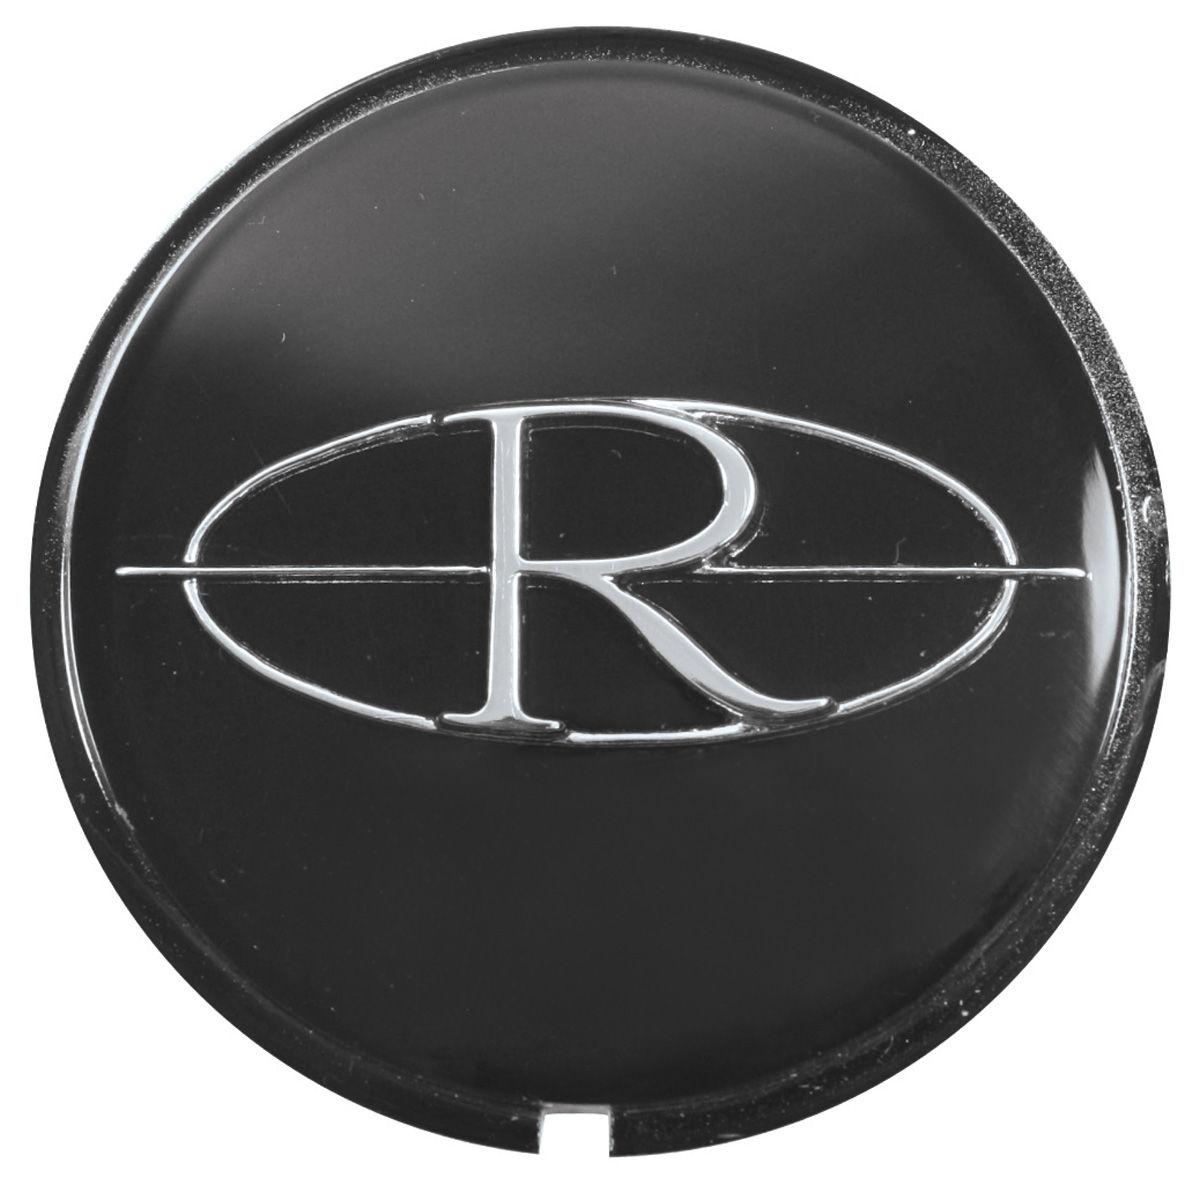 Buick Regal T Type >> Riviera Wheel Center Cap Emblem Fits 1966-70 Riviera ...